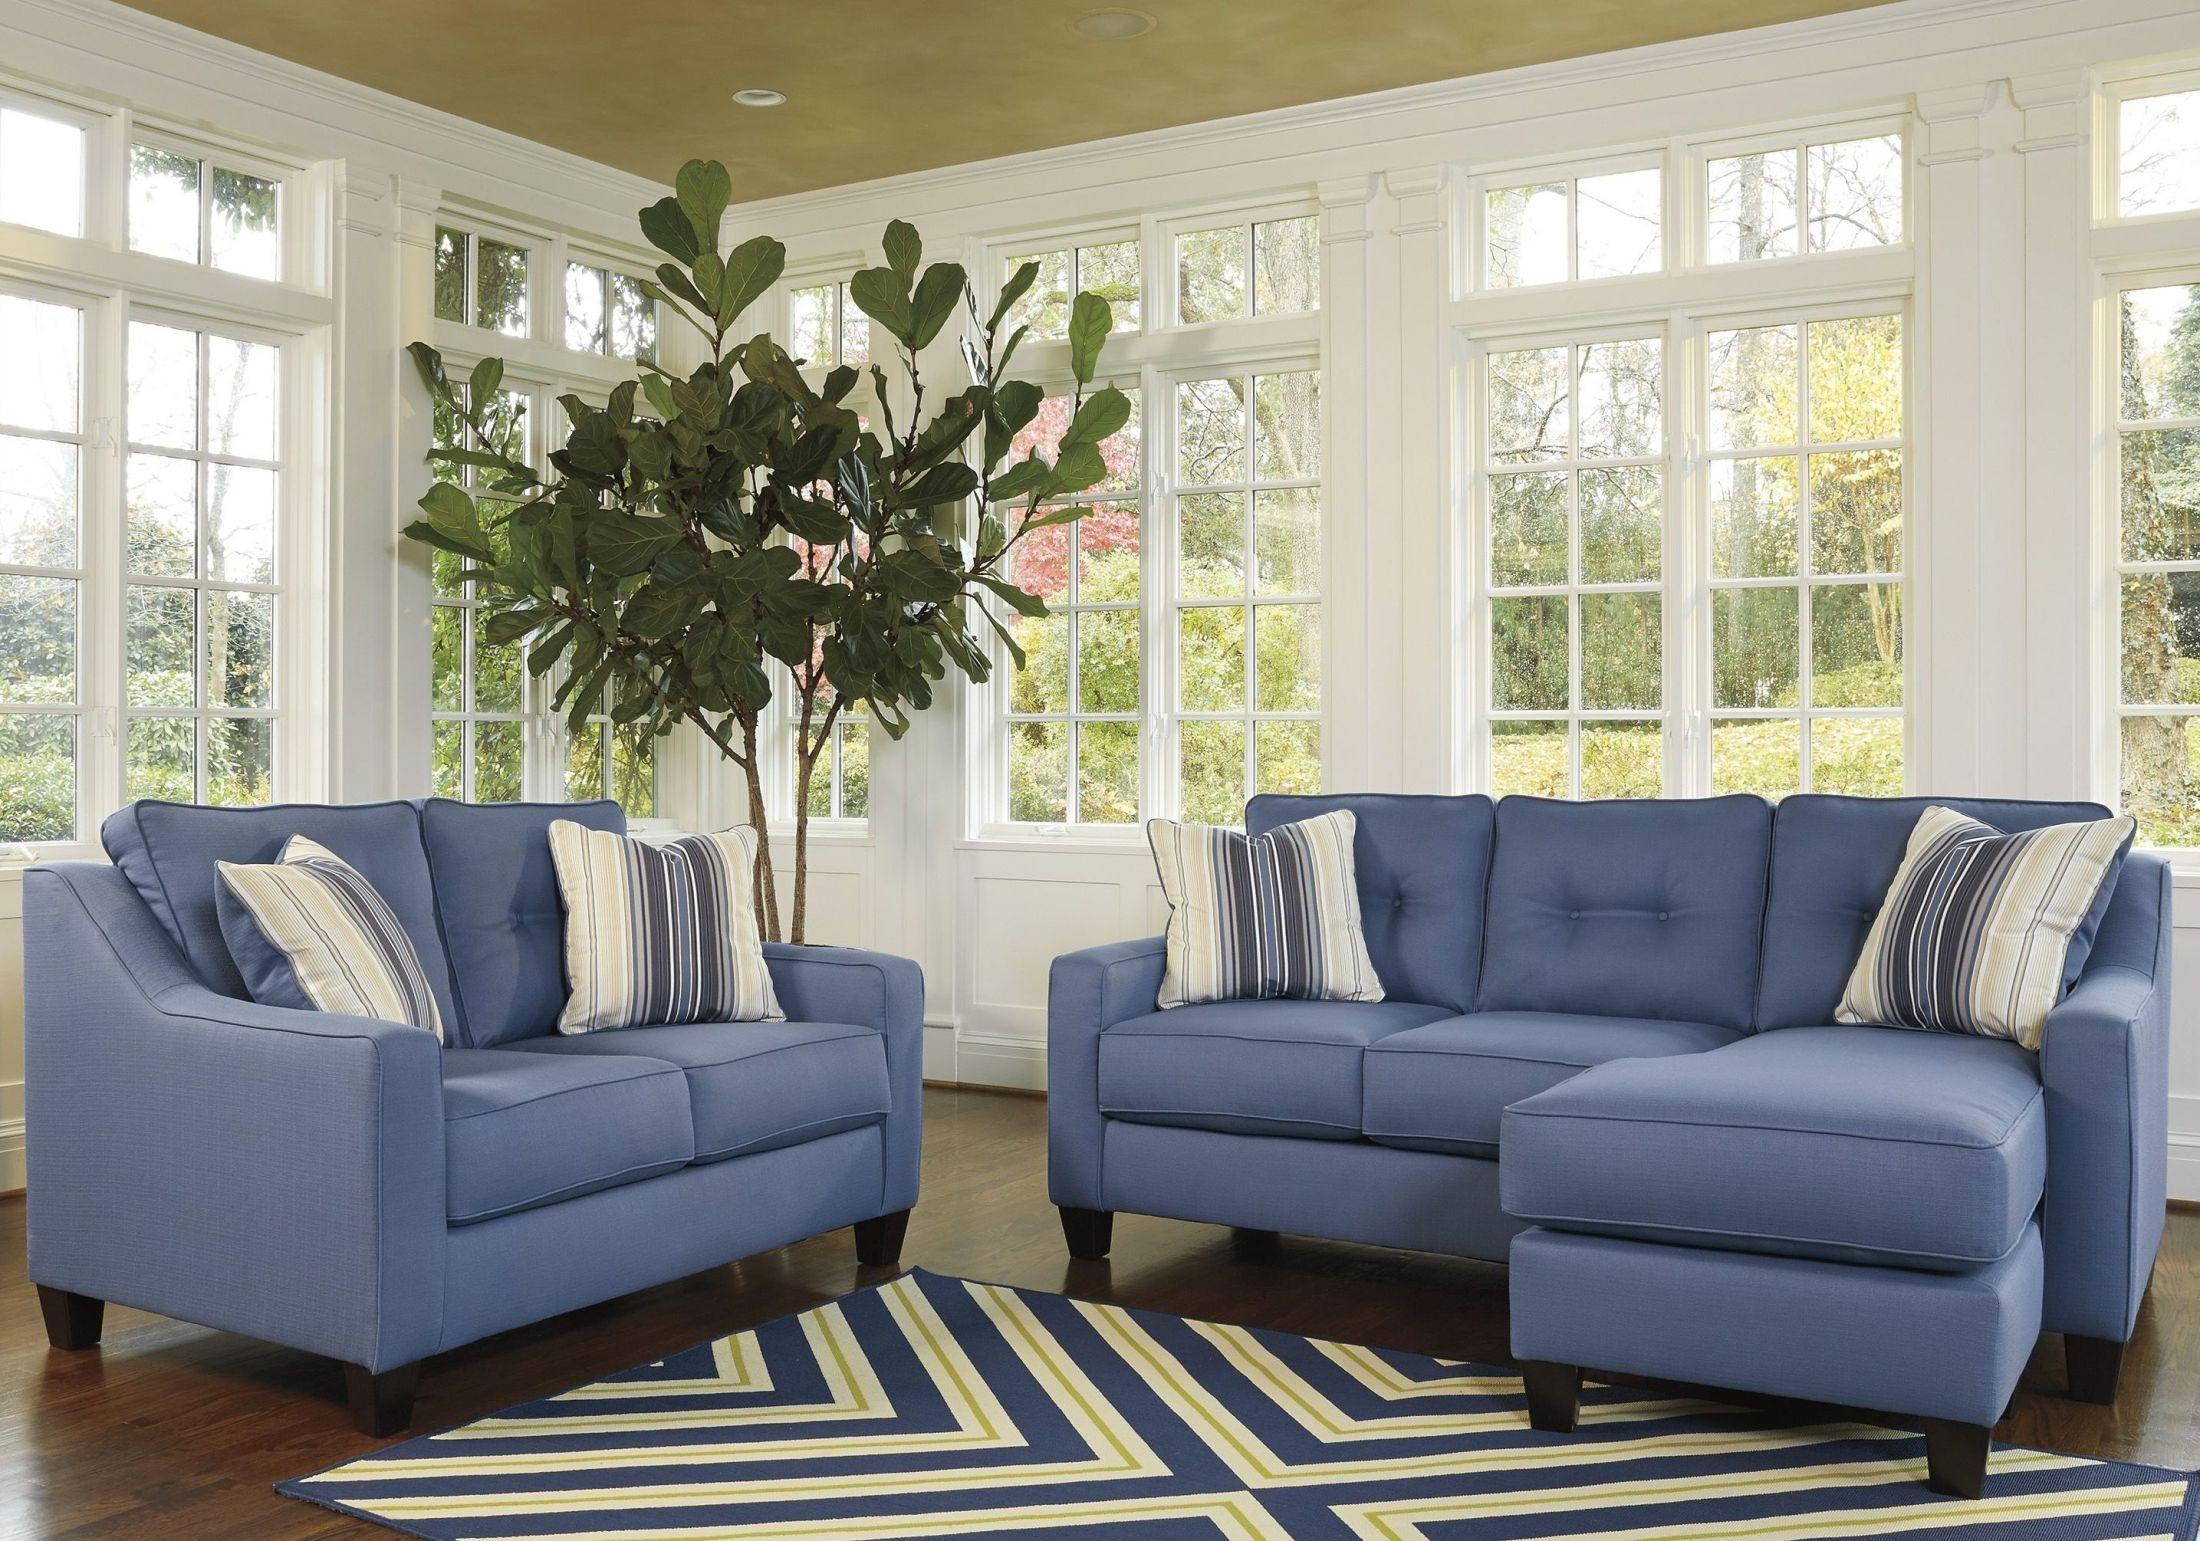 Aldie Nuvella Blue Queen Sofa Chaise Sleeper 6870368 Ashley